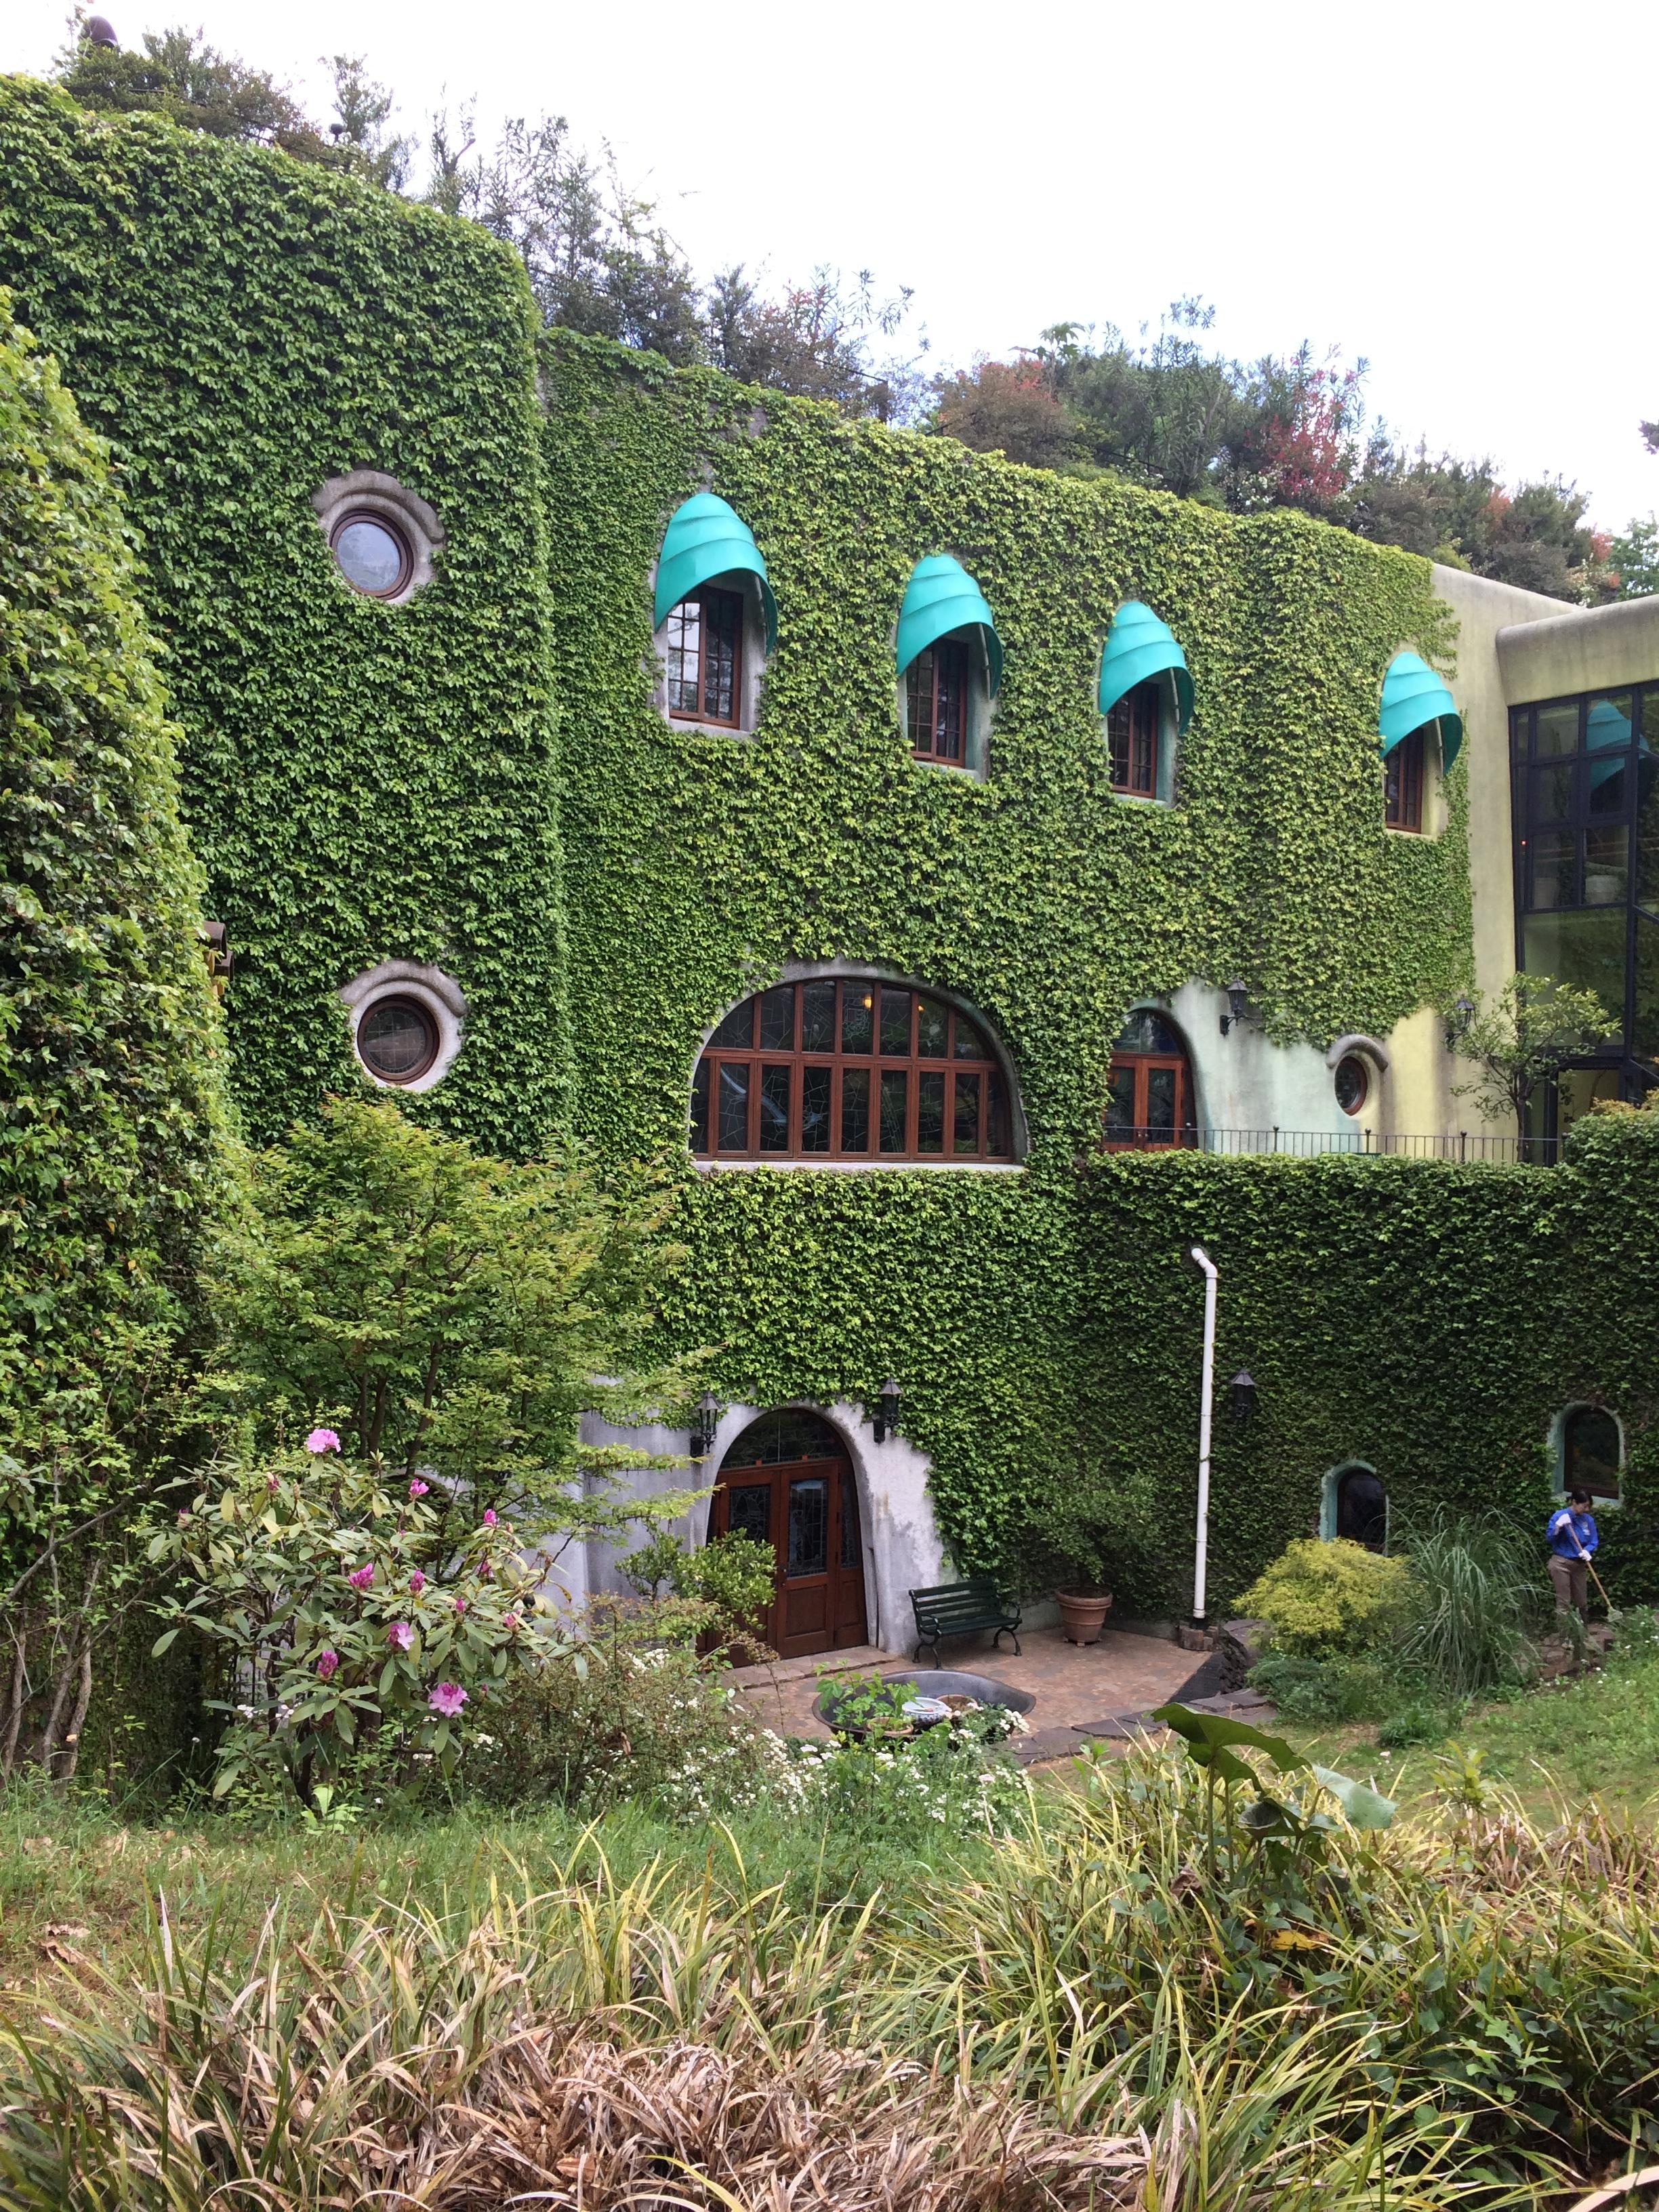 Exterior - Studio Ghibli Museum, Mitaka, Tokyo